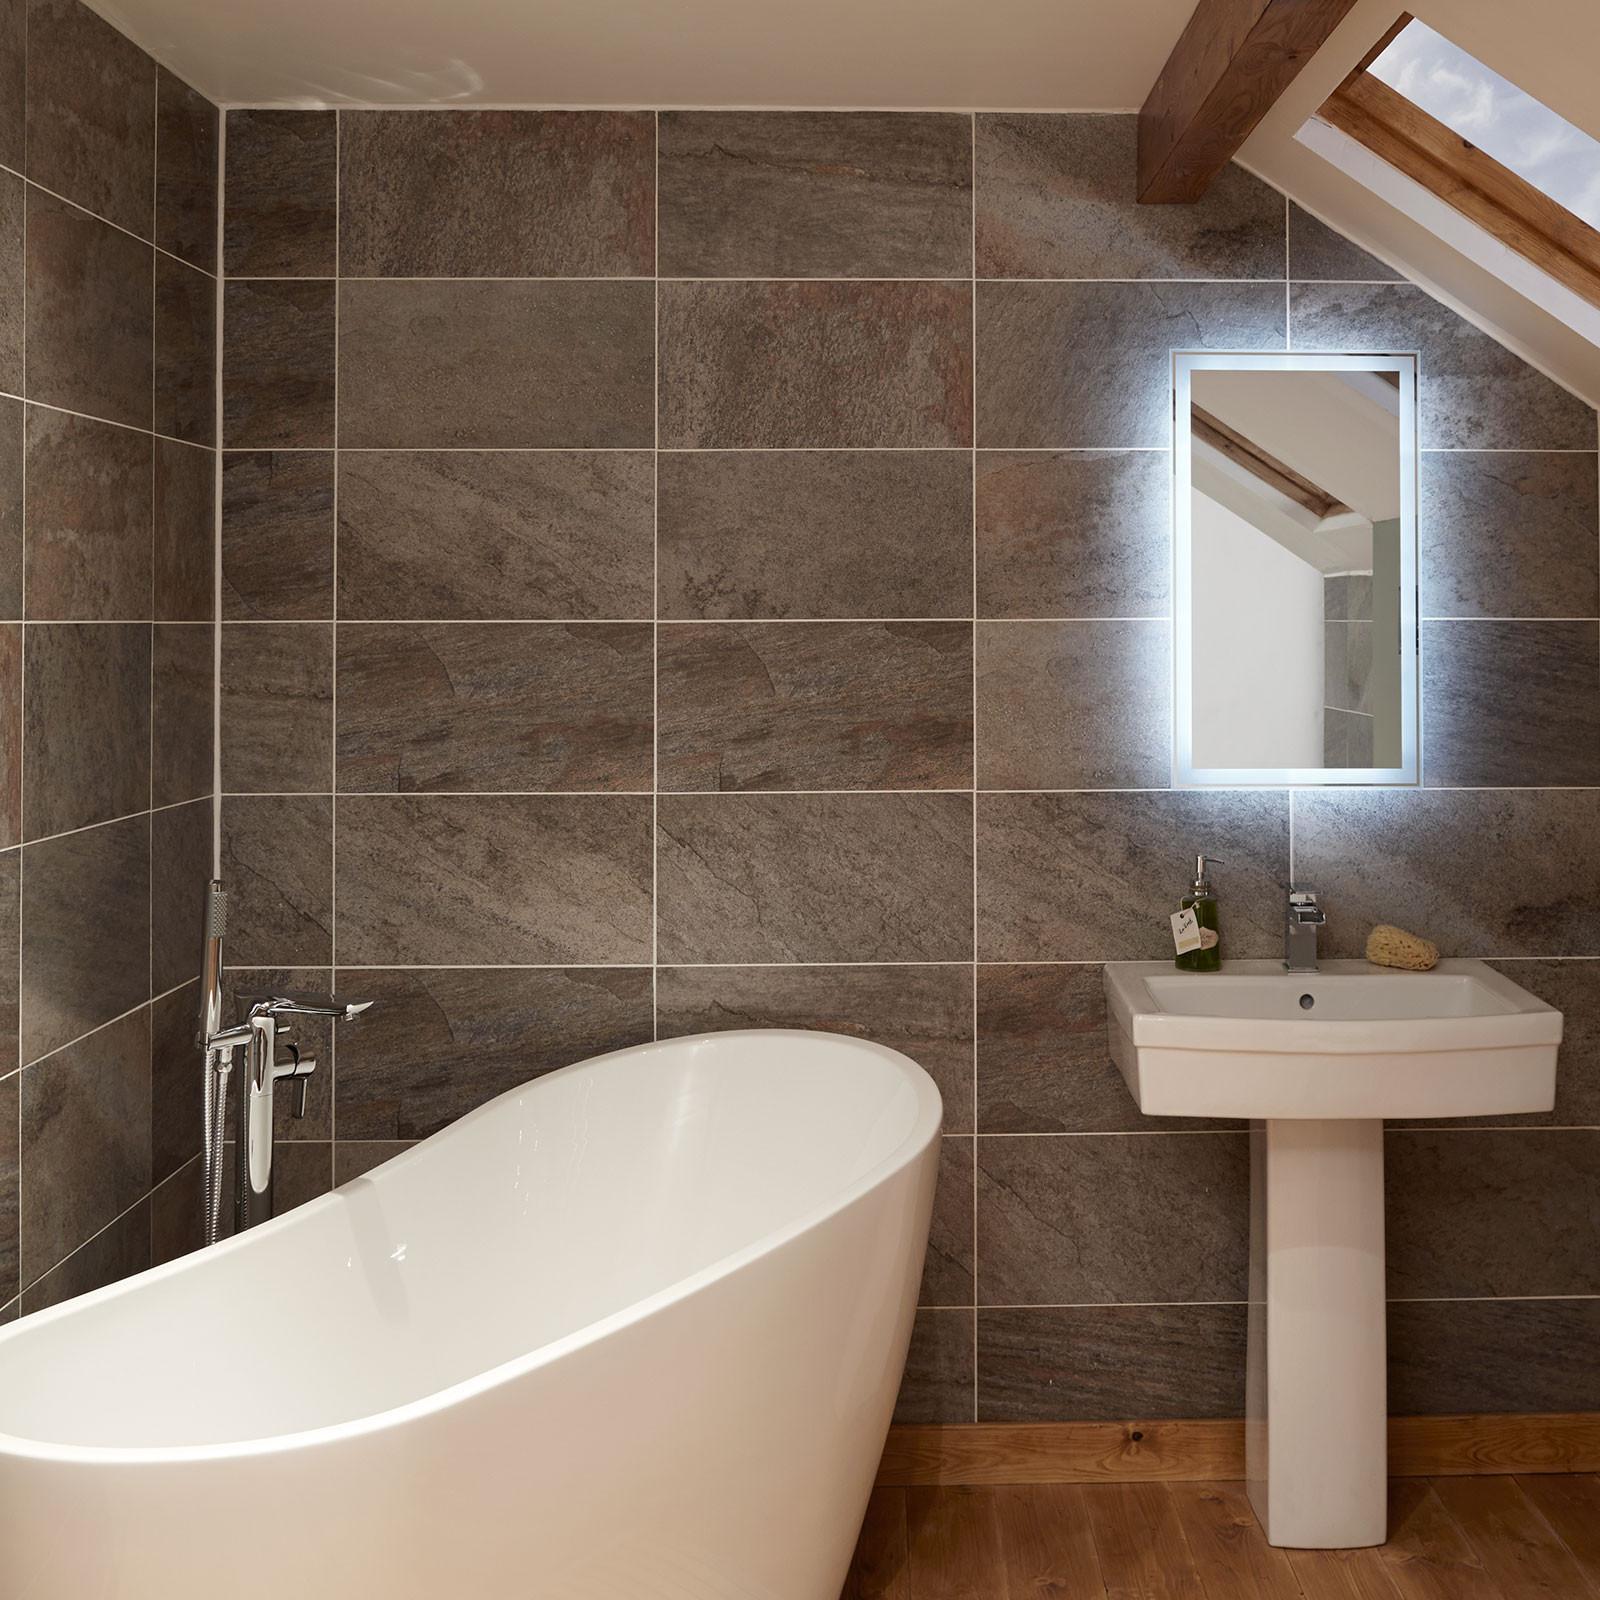 cuarcita musgo wall tile. Black Bedroom Furniture Sets. Home Design Ideas